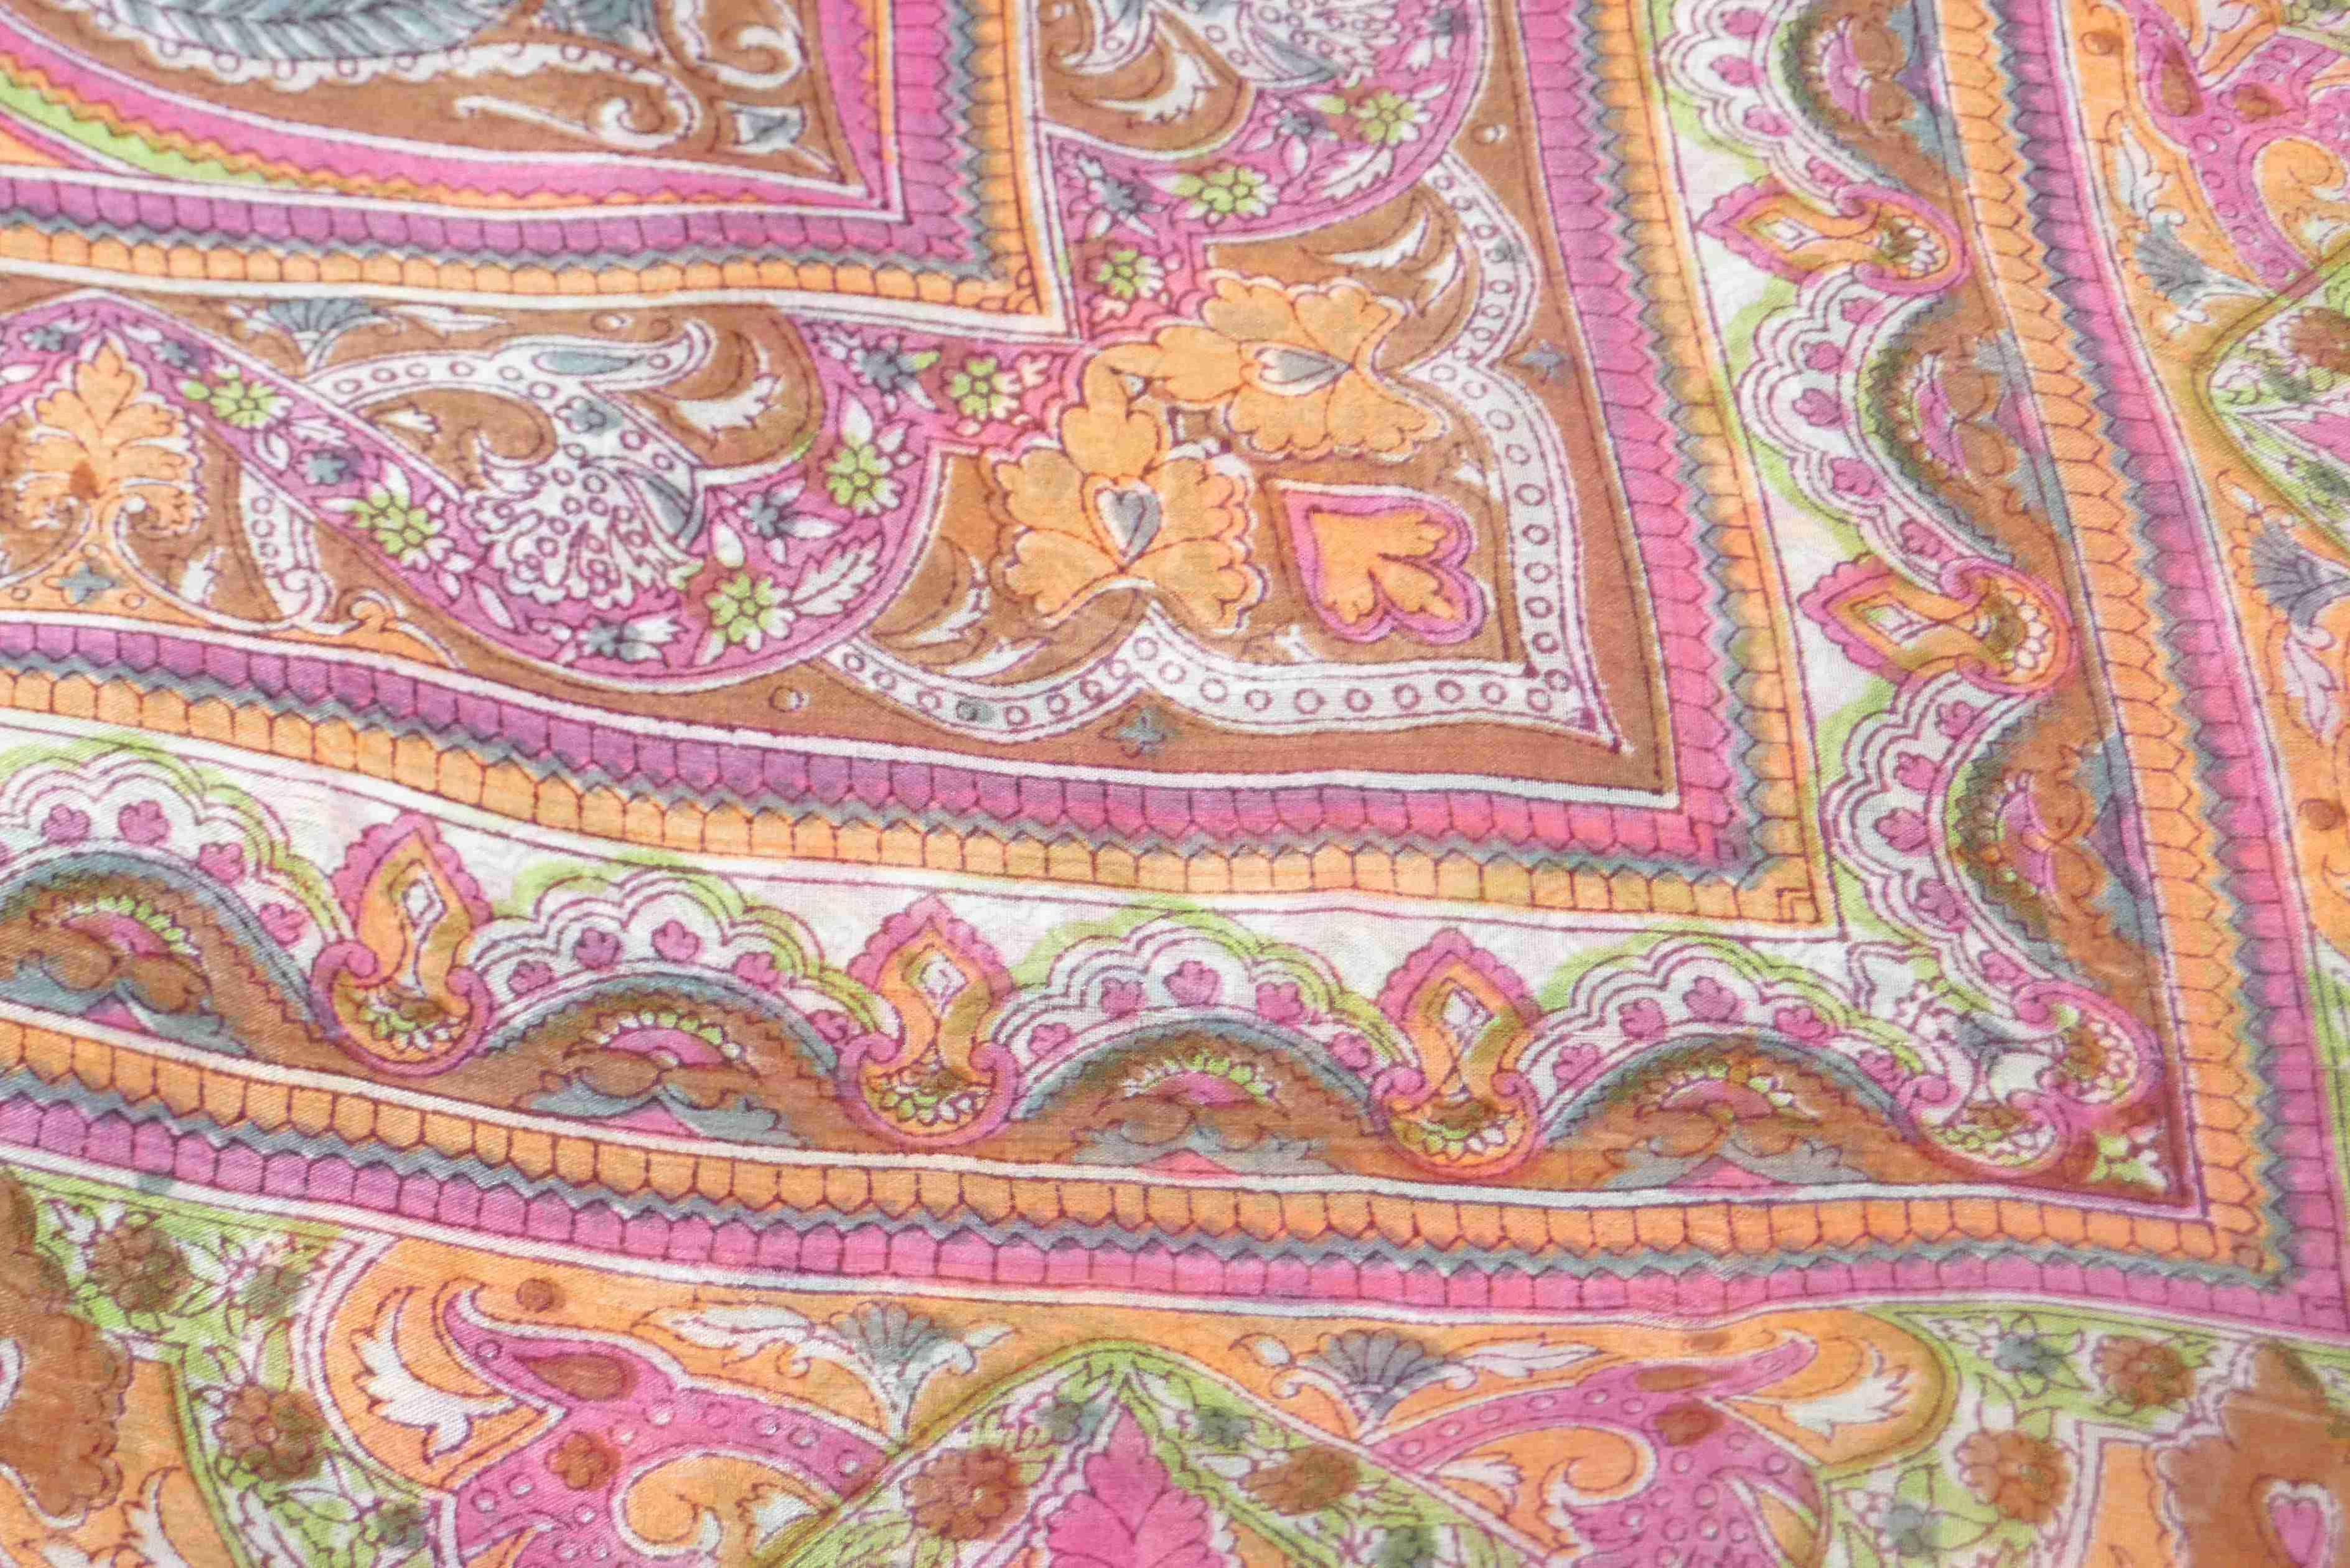 Mulberry Silk Traditional Square Scarf Gandak Caramel by Pashmina & Silk